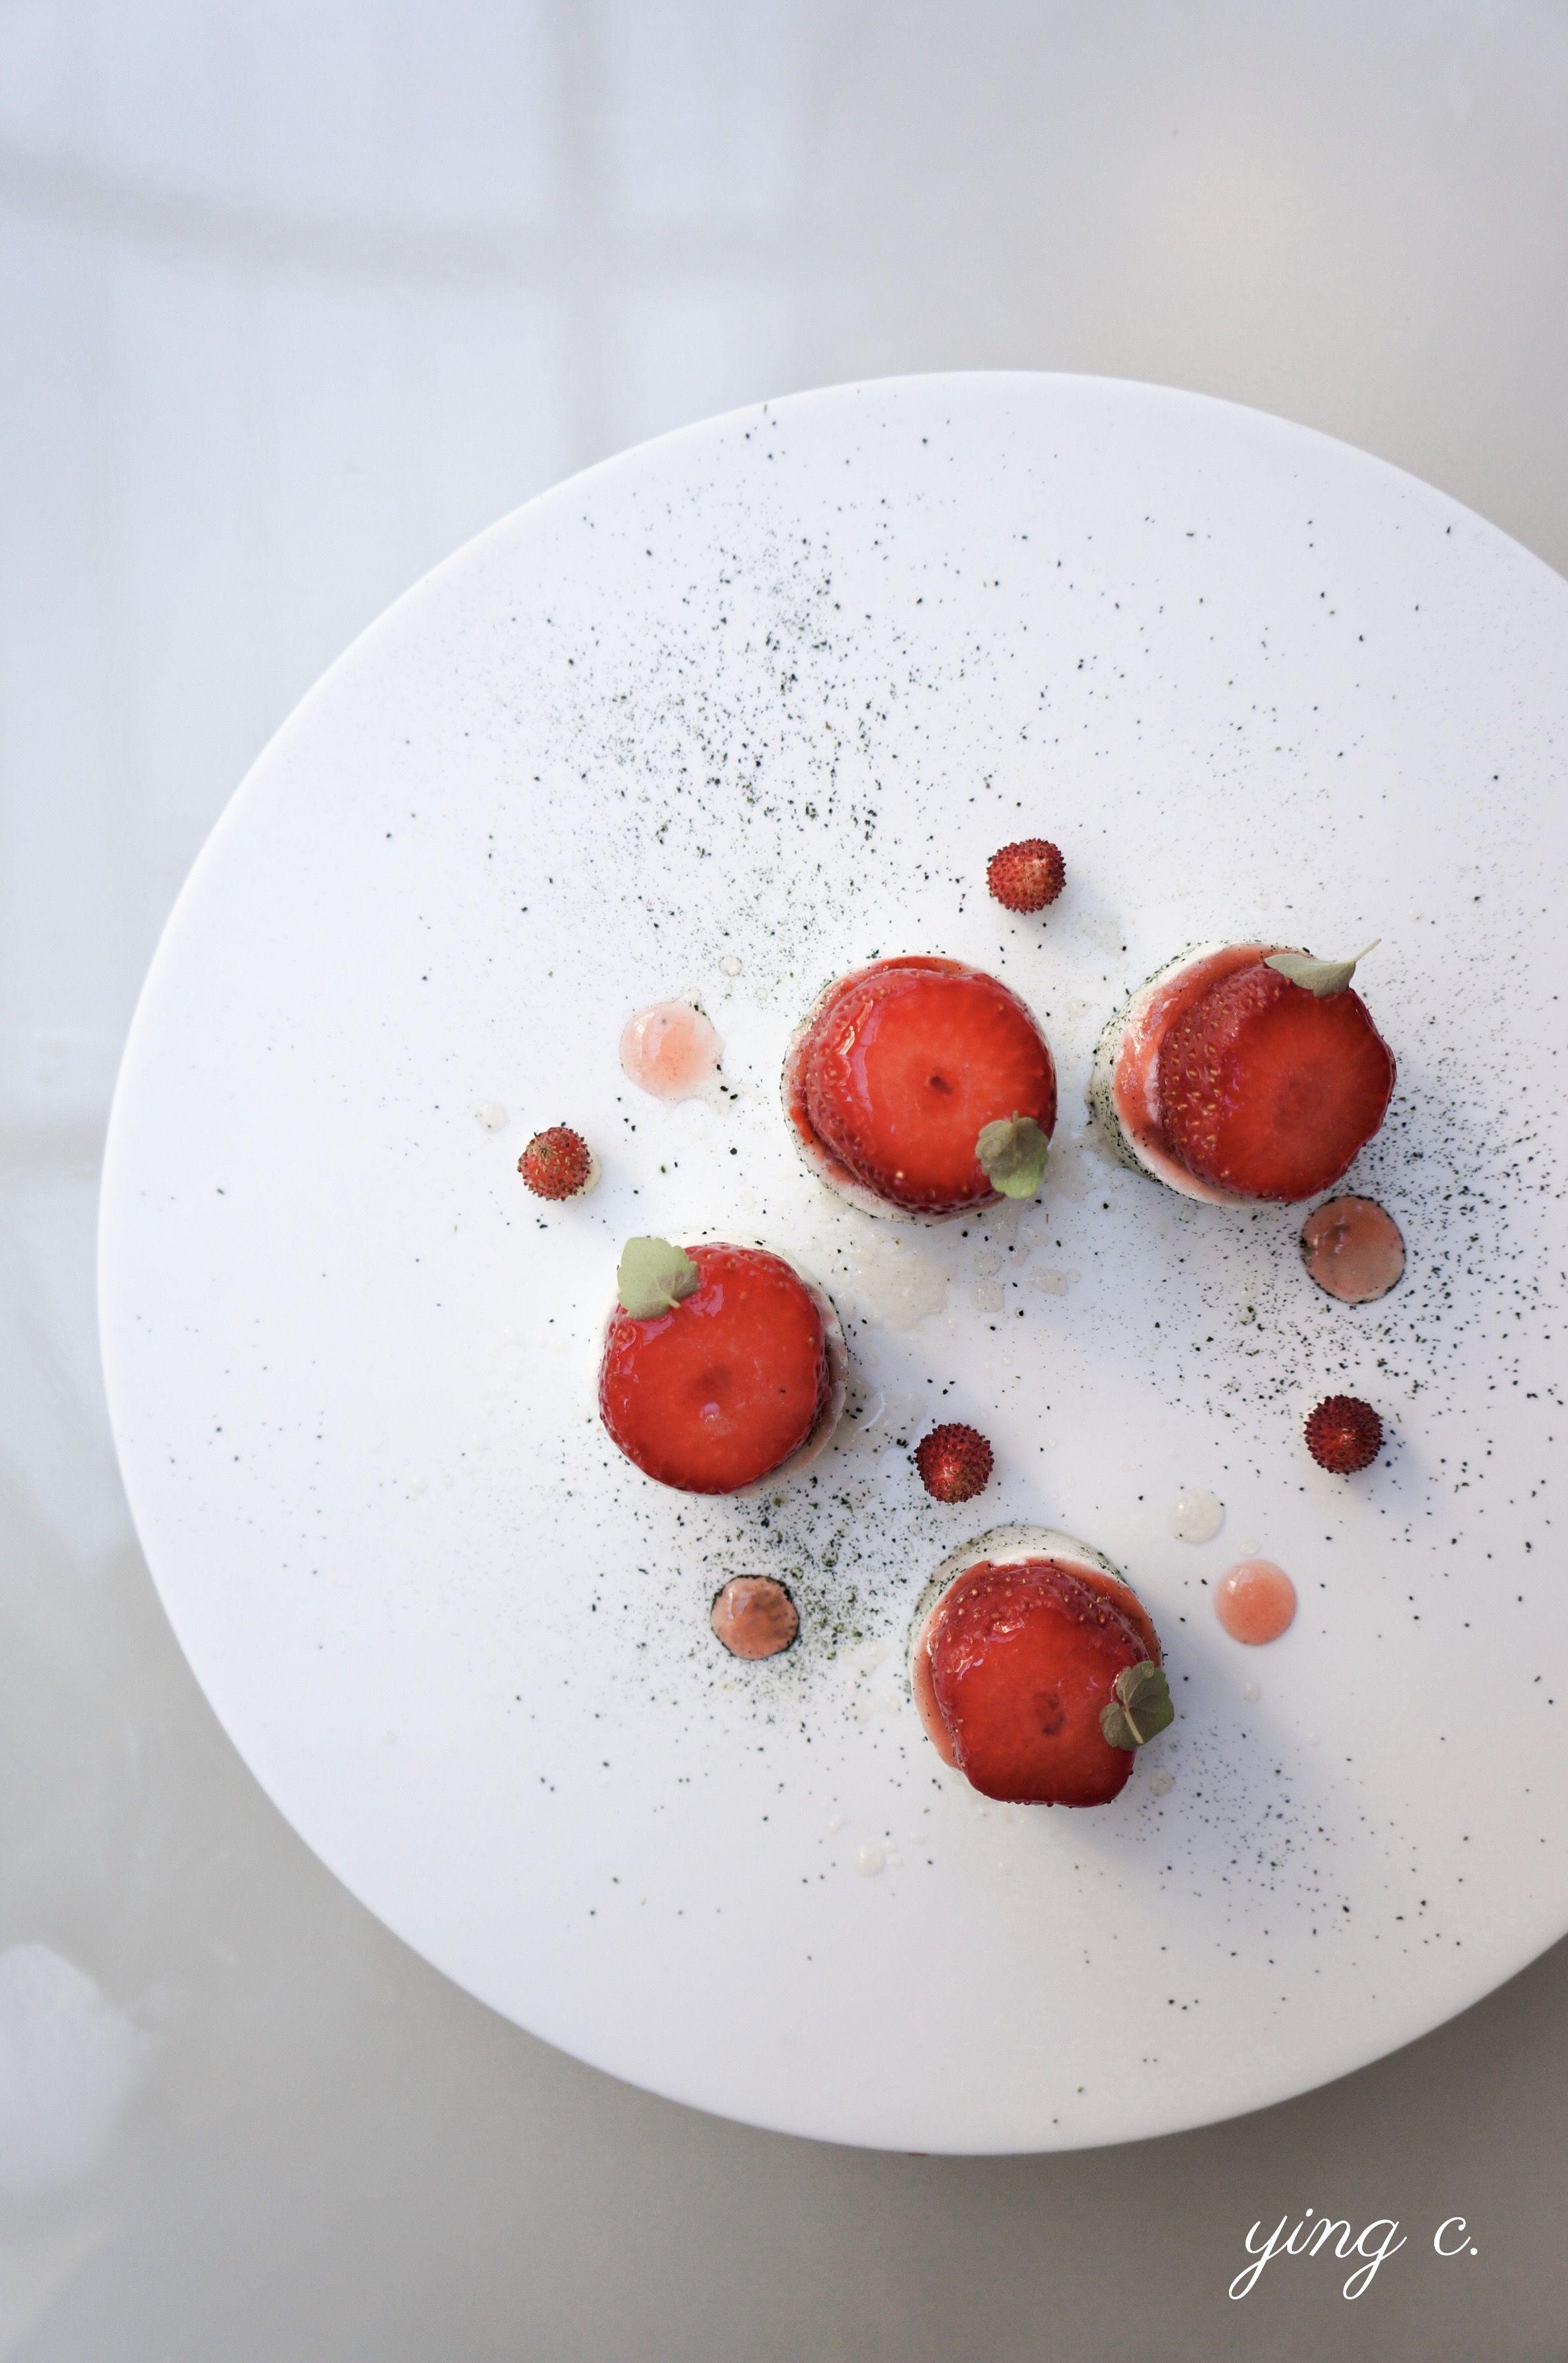 L'Orangerie 餐廳的 2019 夏季新甜點「Fraises tièdes et romarin」(微溫草莓、迷迭香)。從甜點的結構、擺盤方式等,都能看出經過縝密思考與設計。